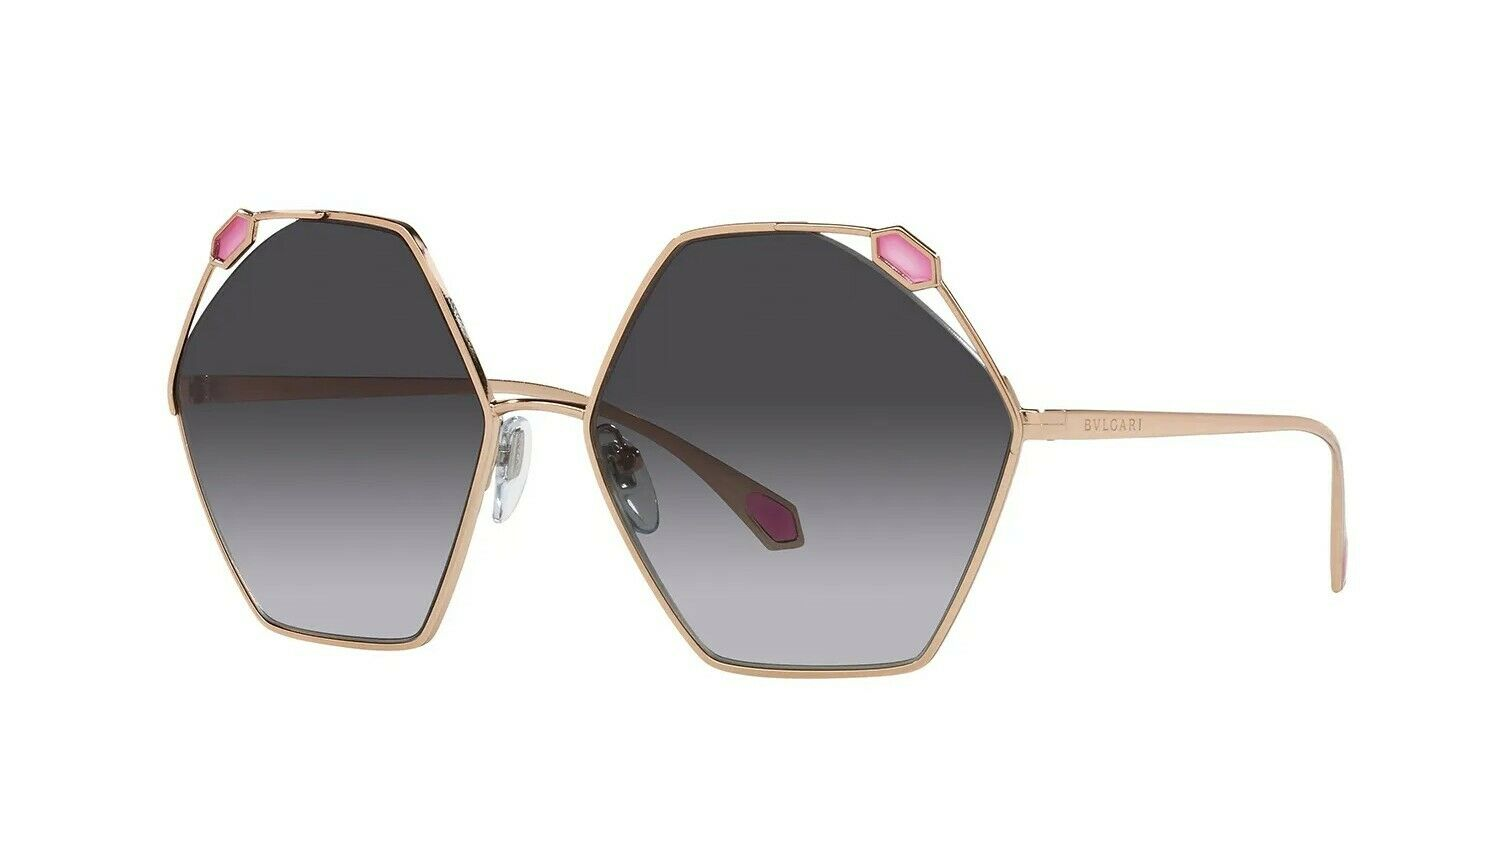 Bvlgari SERPENTI BV 6160 Rose Gold/Grey Shaded (2014/8G) Sunglasses